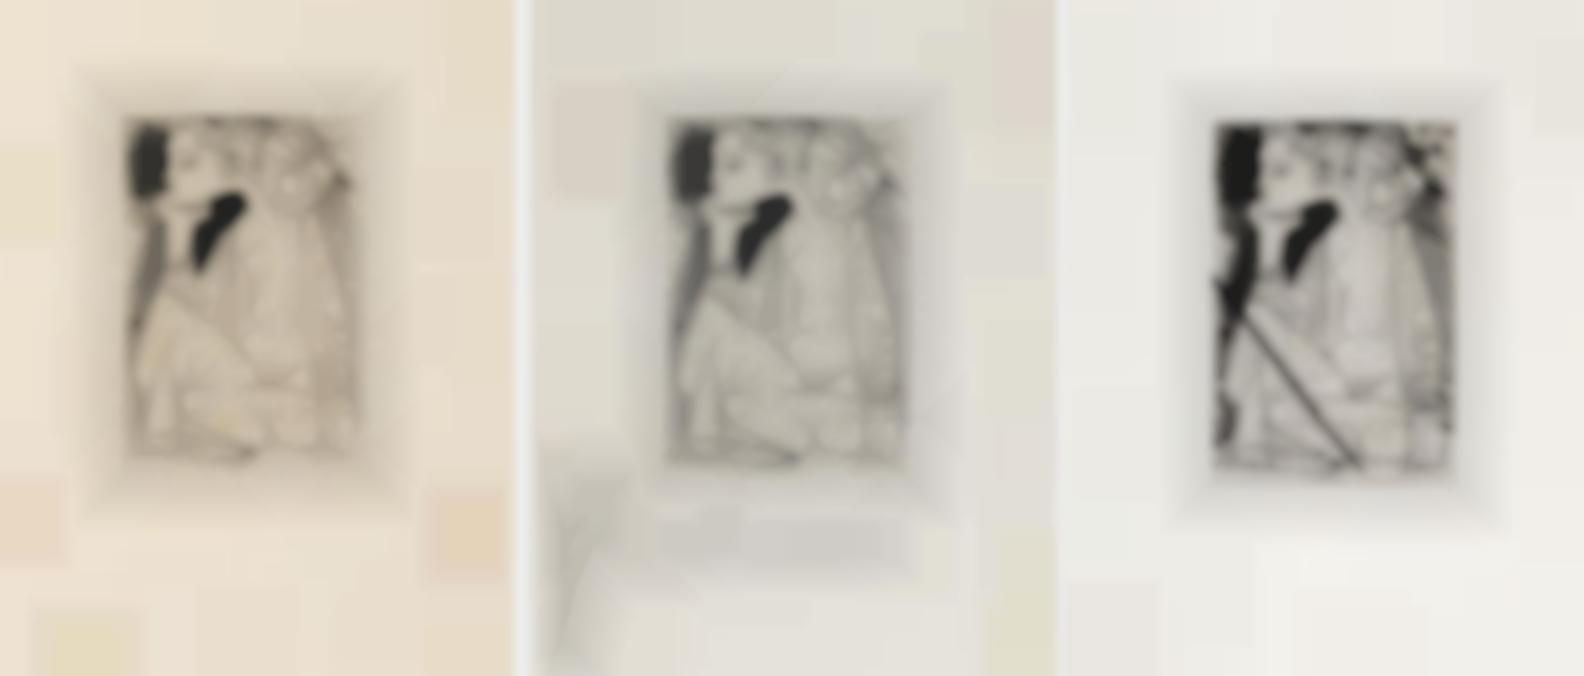 Pablo Picasso-Femme Assise En Tailleur: Genevieve Laporte, For Recordant El Doctor Reventos, 1969 (Bloch1837; Baer 888; Cramer Books 147)-1951